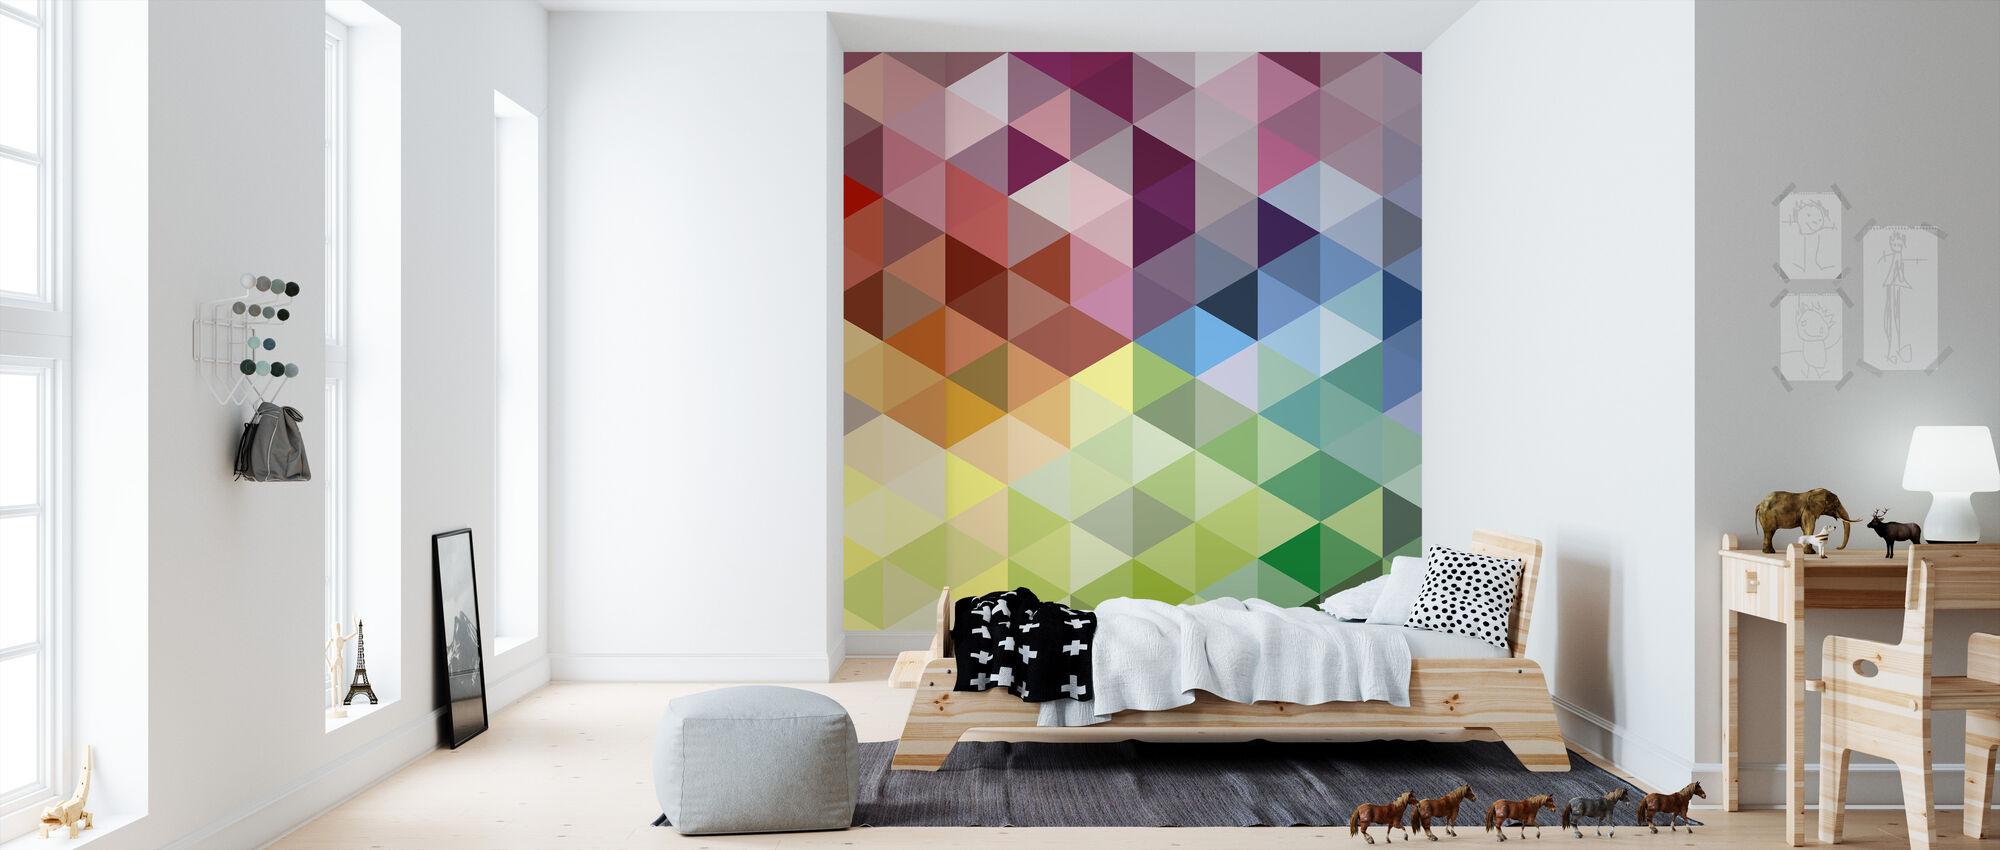 colorful triangles fototapete nach ma photowall. Black Bedroom Furniture Sets. Home Design Ideas